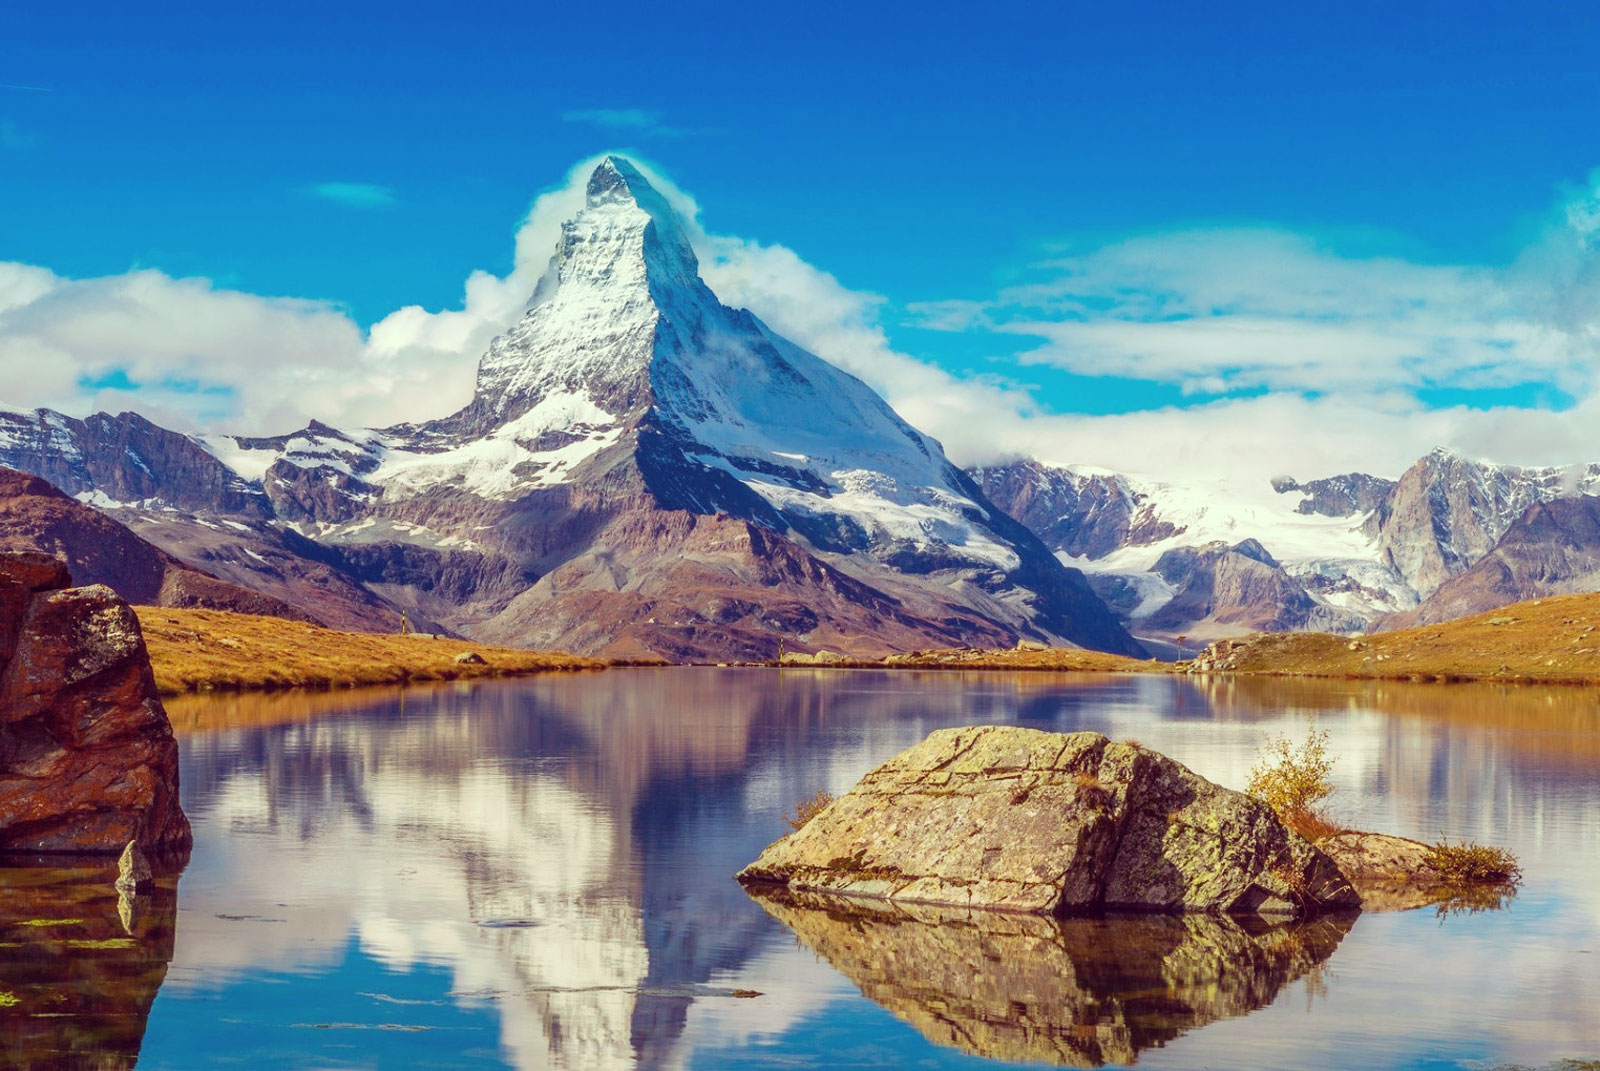 Туры в Швейцарию из Казани,Гора Маттерхорн